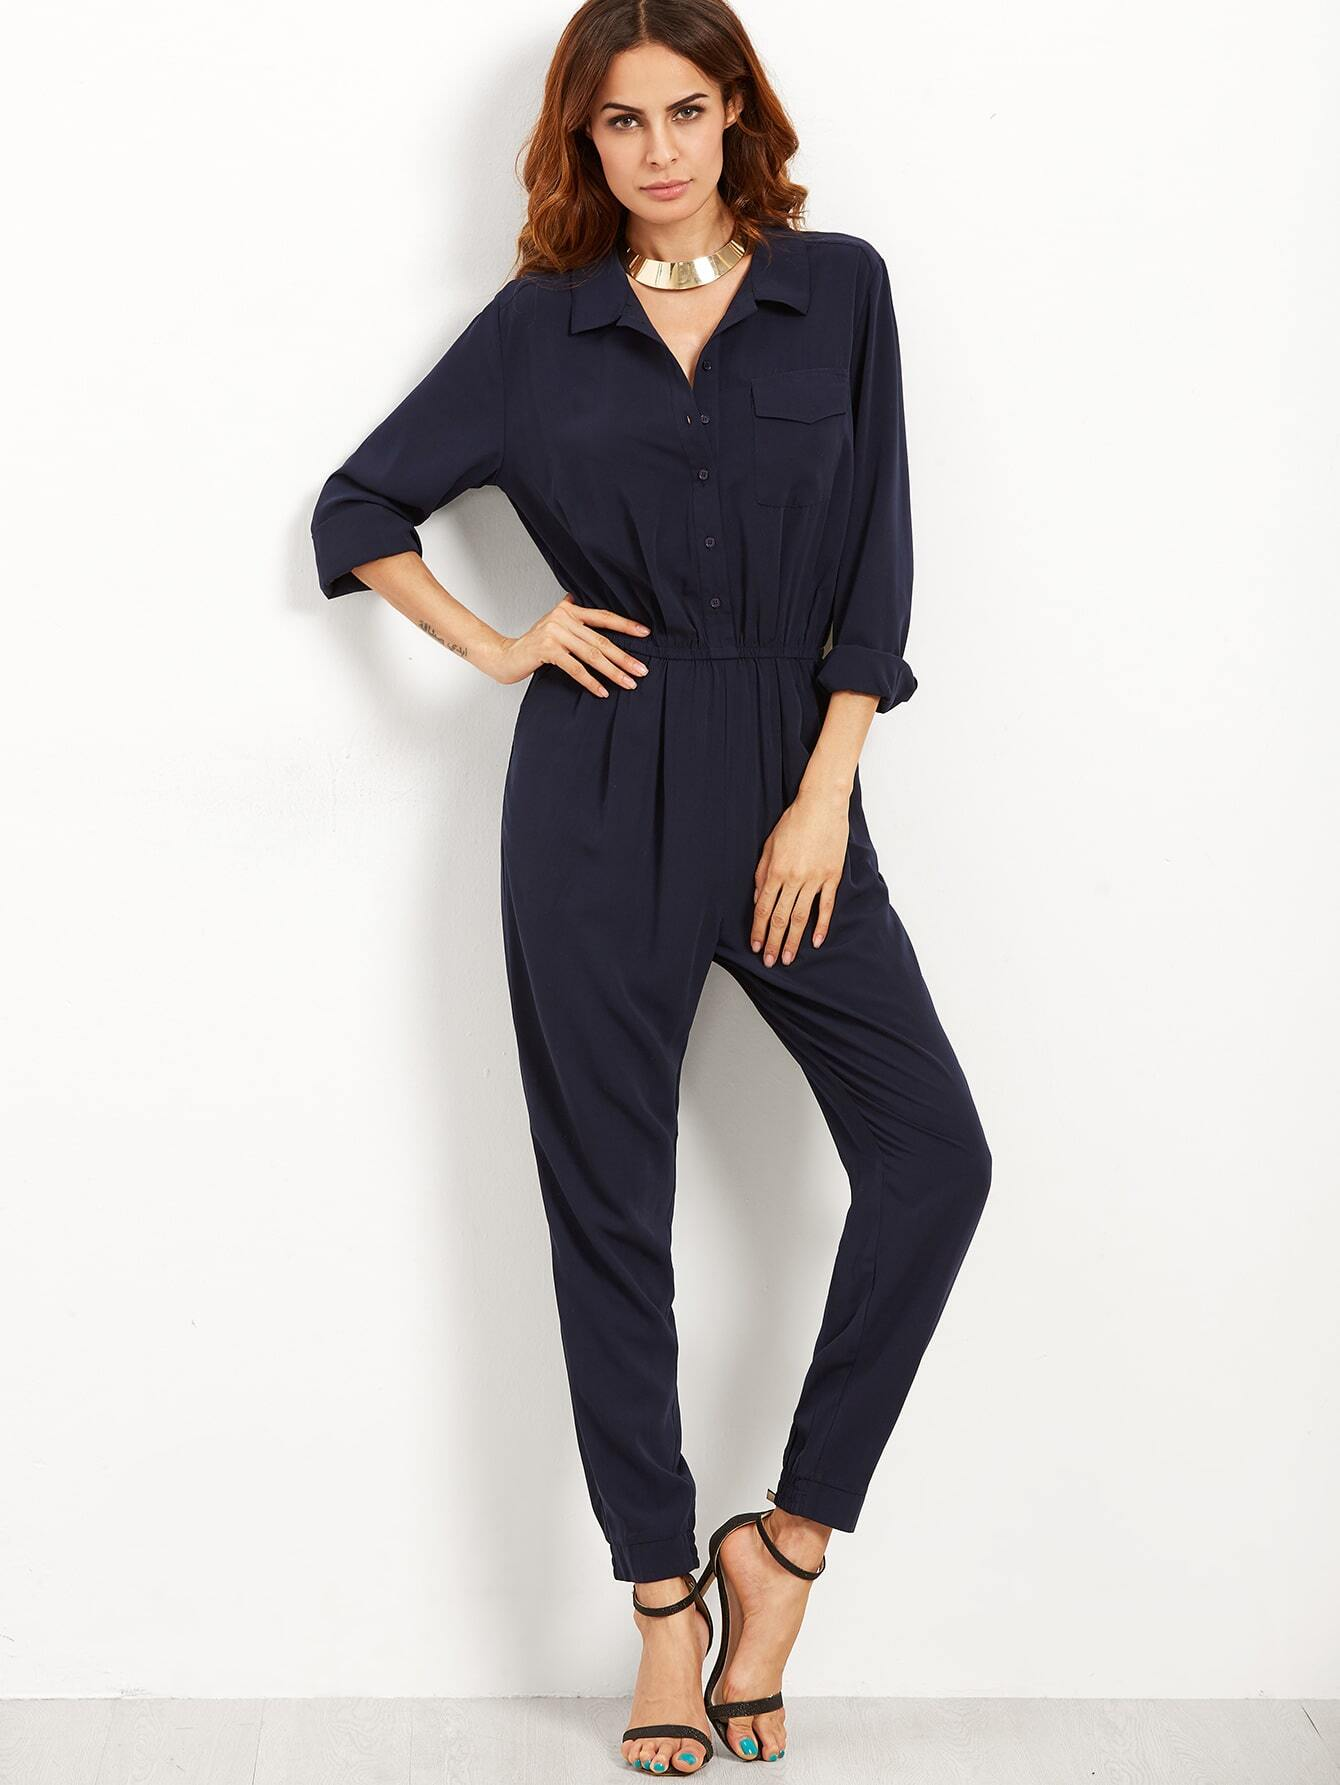 combi pantalon taille lastique avec boutons bleu marine french shein sheinside. Black Bedroom Furniture Sets. Home Design Ideas